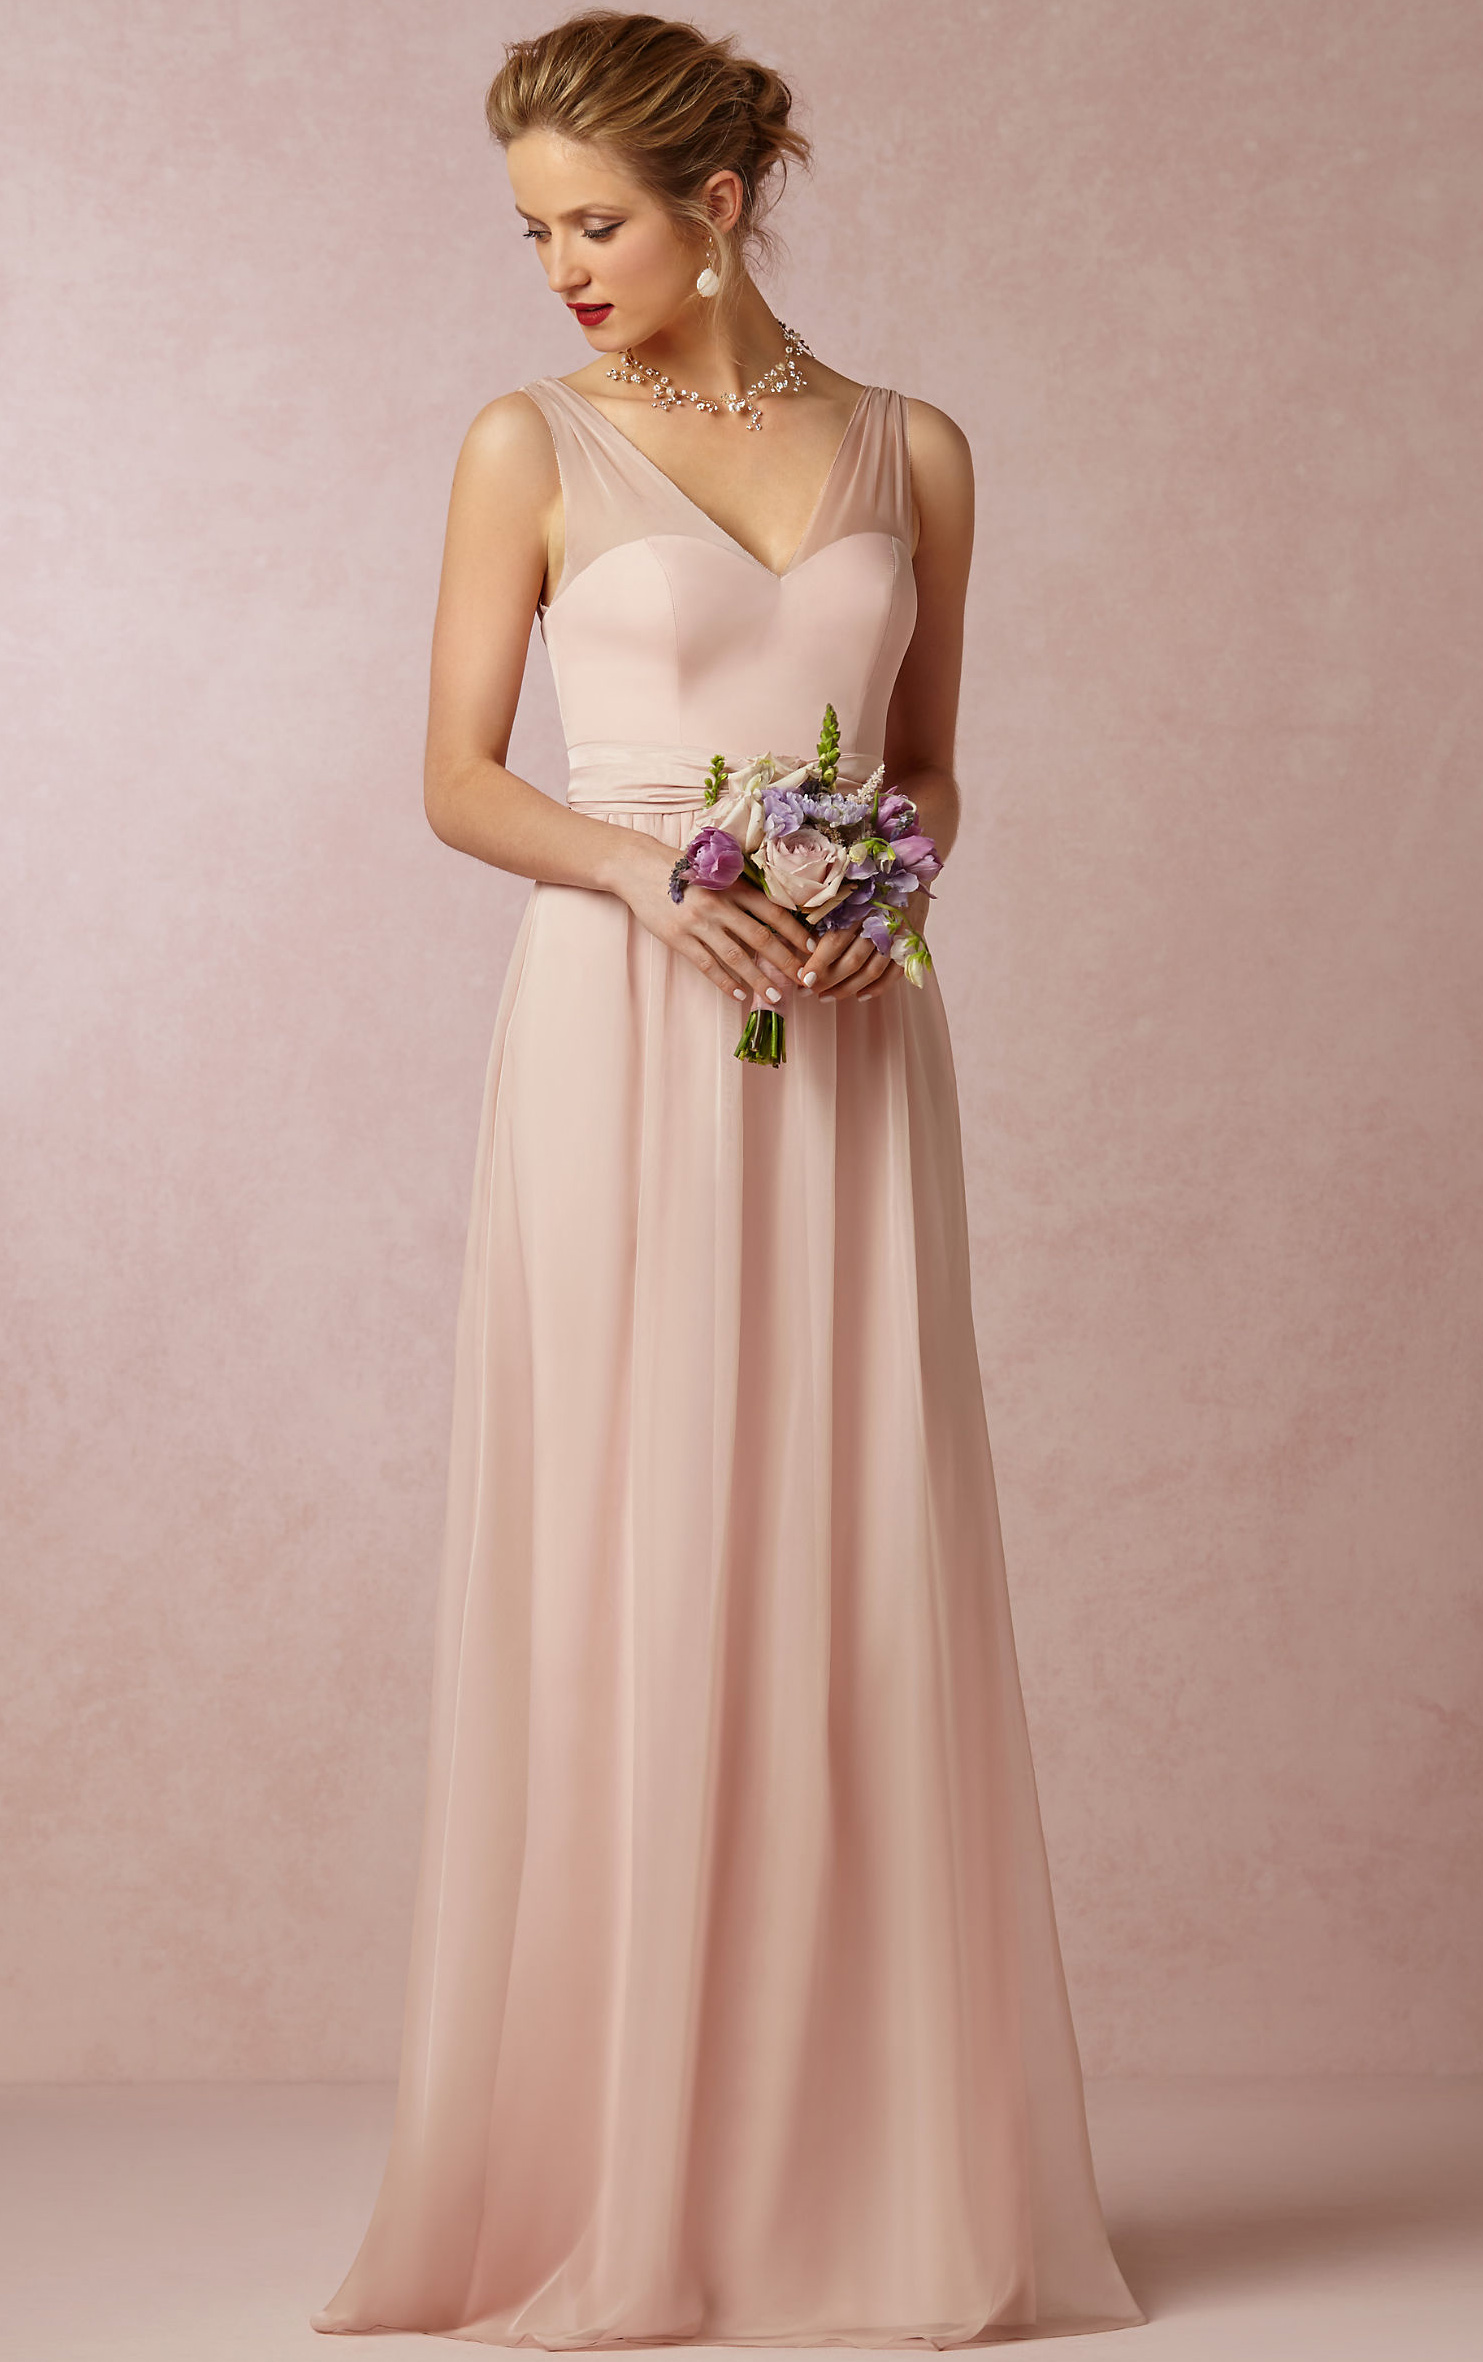 Pink And White Bridesmaid Dresses Uk - Junoir Bridesmaid Dresses